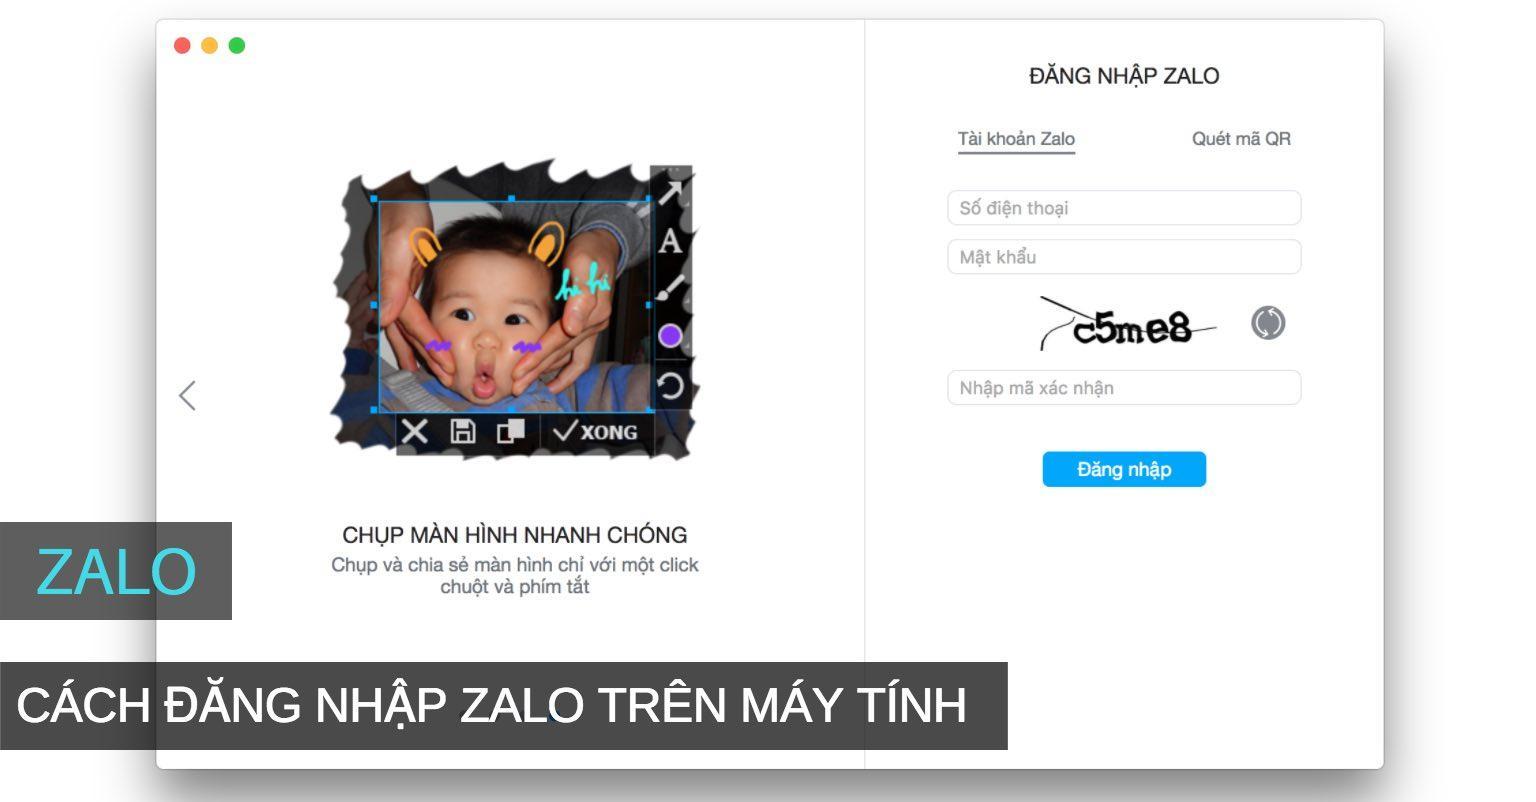 cách đăng nhập tài khoản Zalo